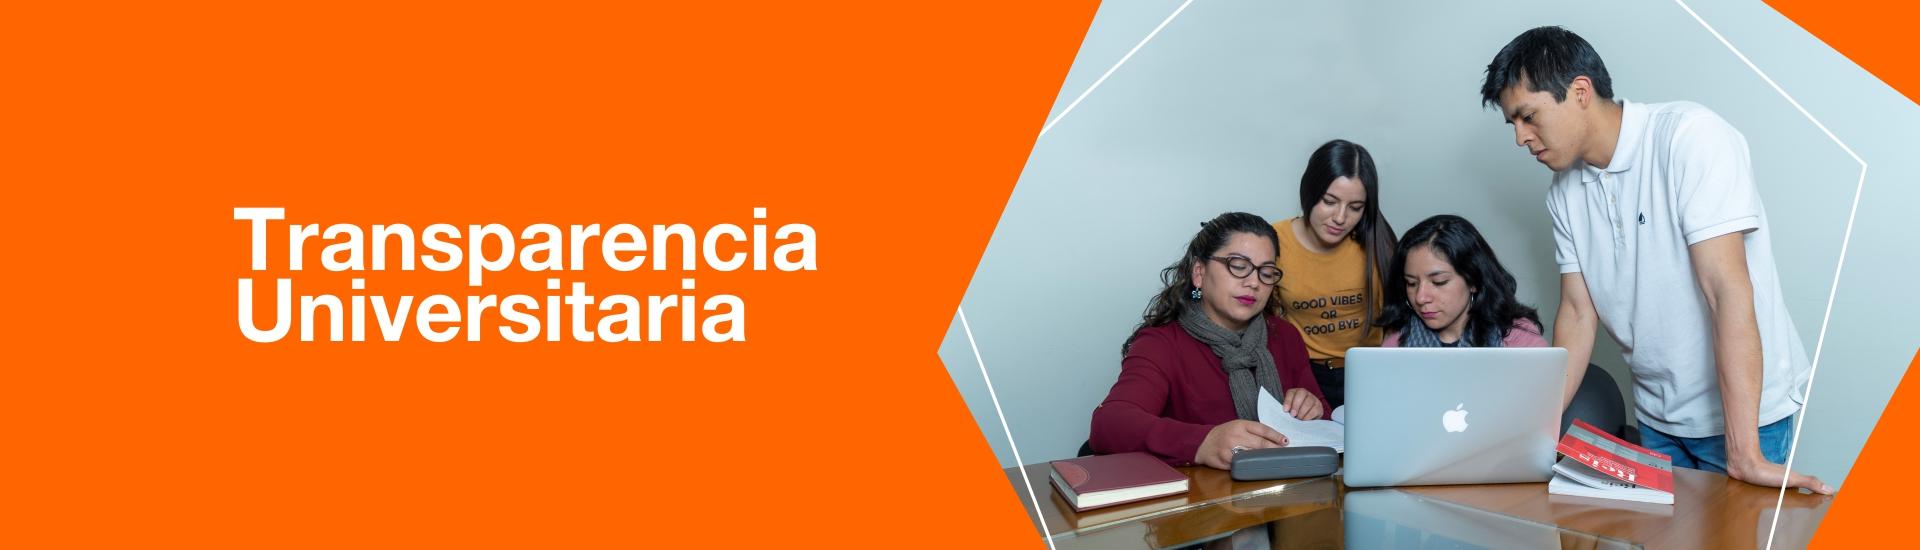 Transparencia Universitaria_Cintillo(1)